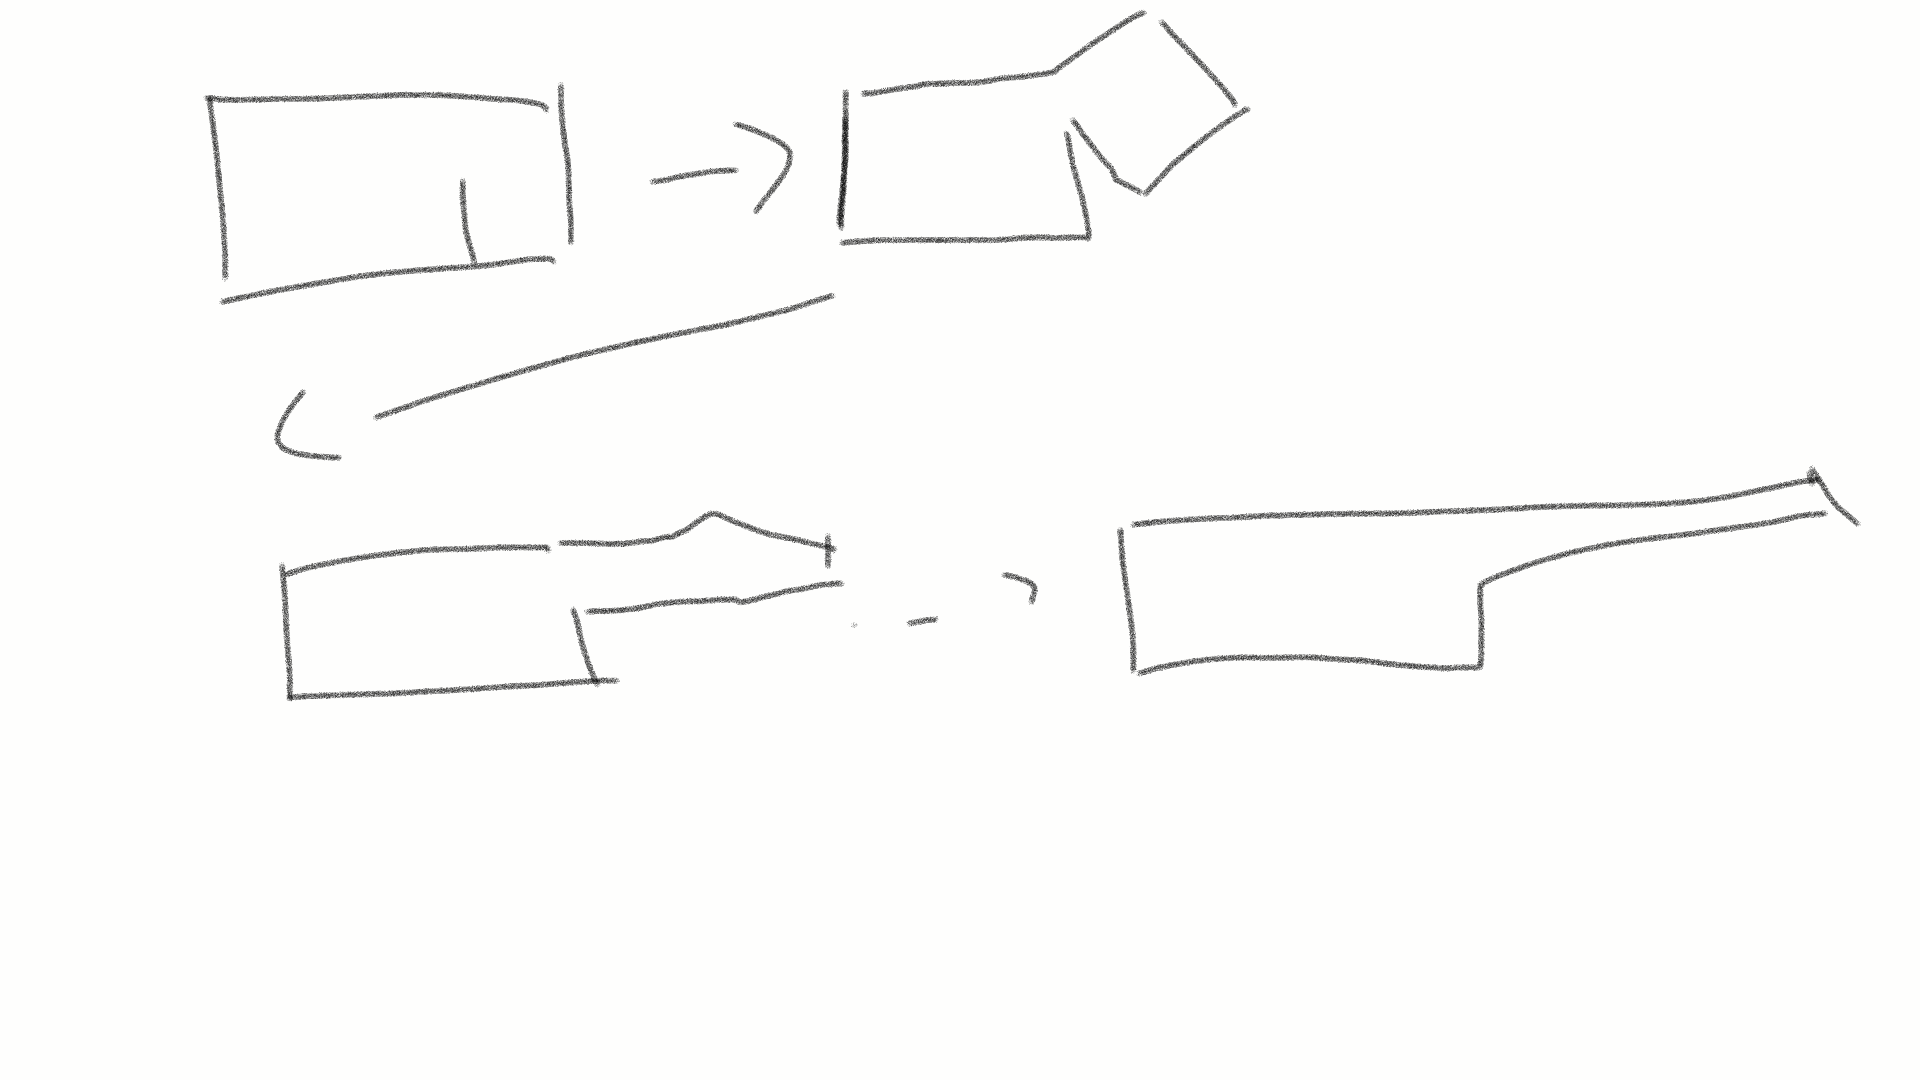 sketch-1509781896222.png